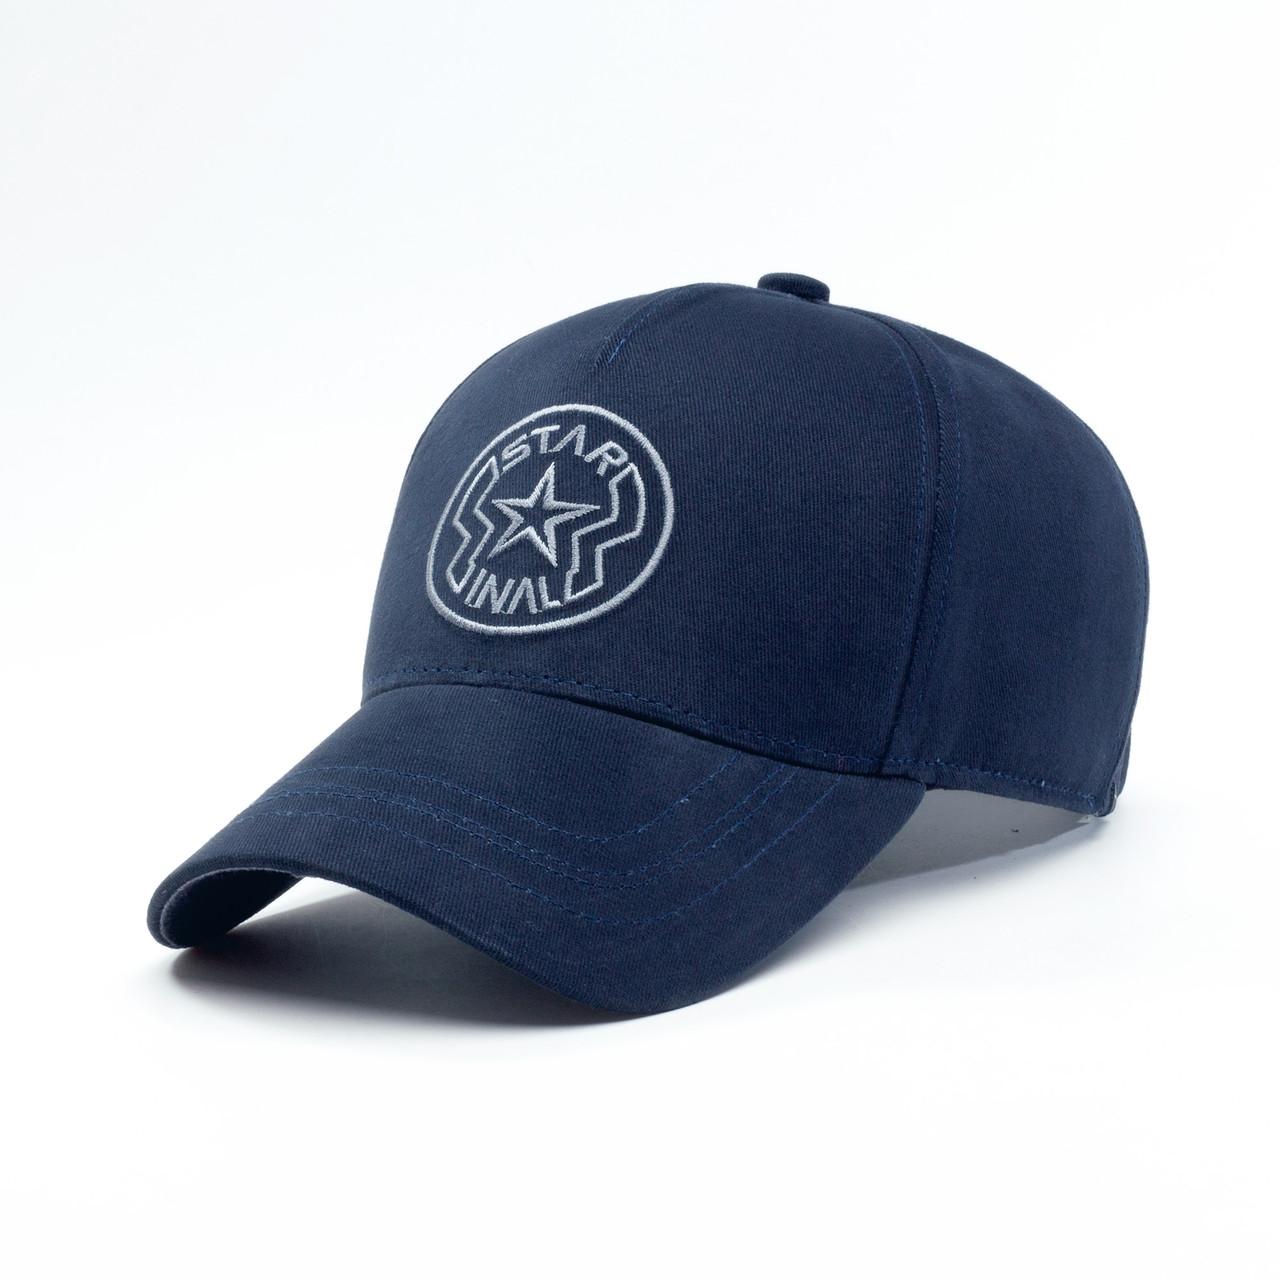 Детская кепка бейсболка INAL star XS / 51-52 RU Синий 237851